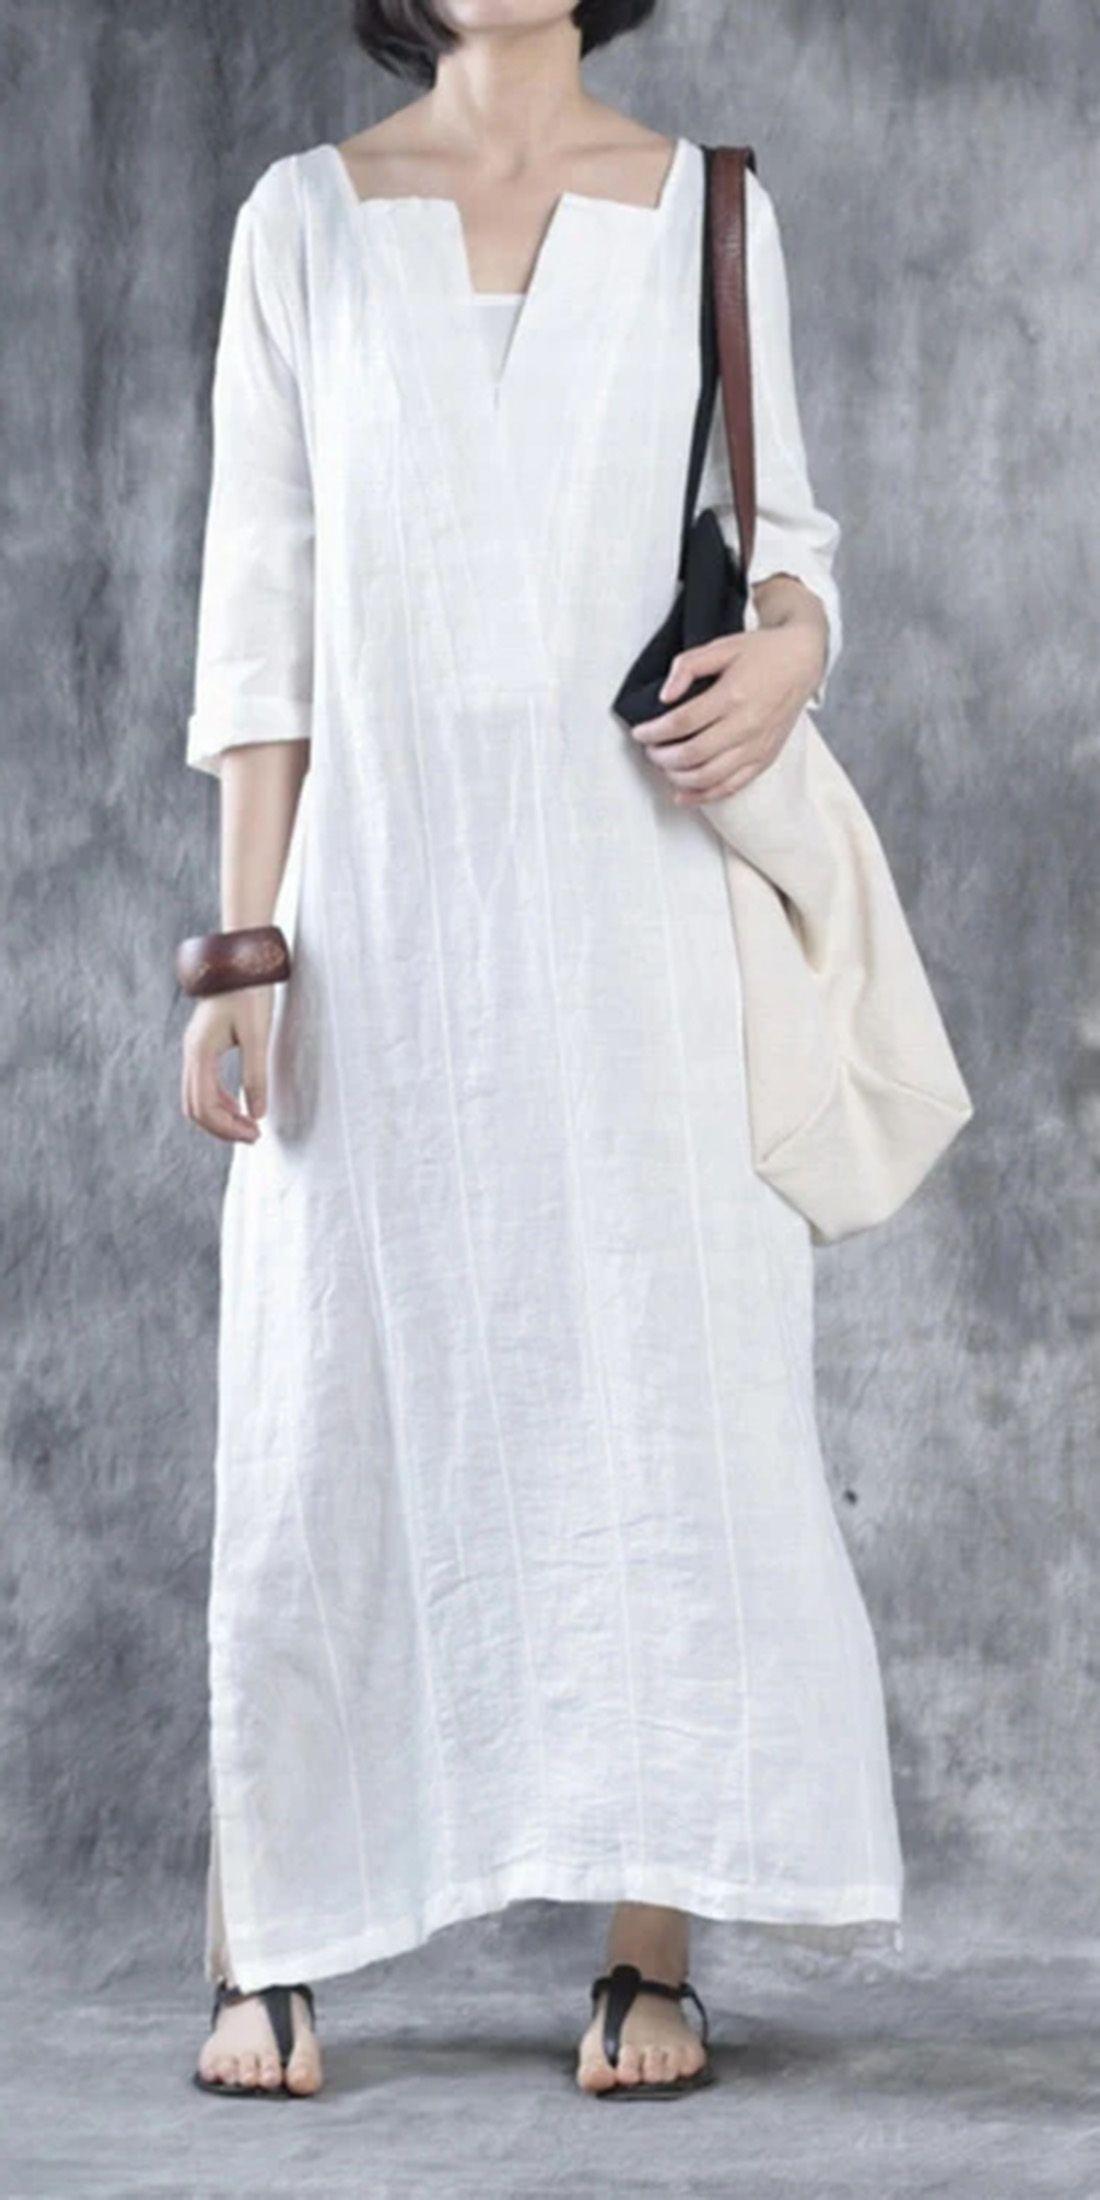 White Linen Dresses Oversize Maxi Dress Linen Caftans In 2021 White Linen Dresses Fashion Linen Dresses [ 2200 x 1100 Pixel ]